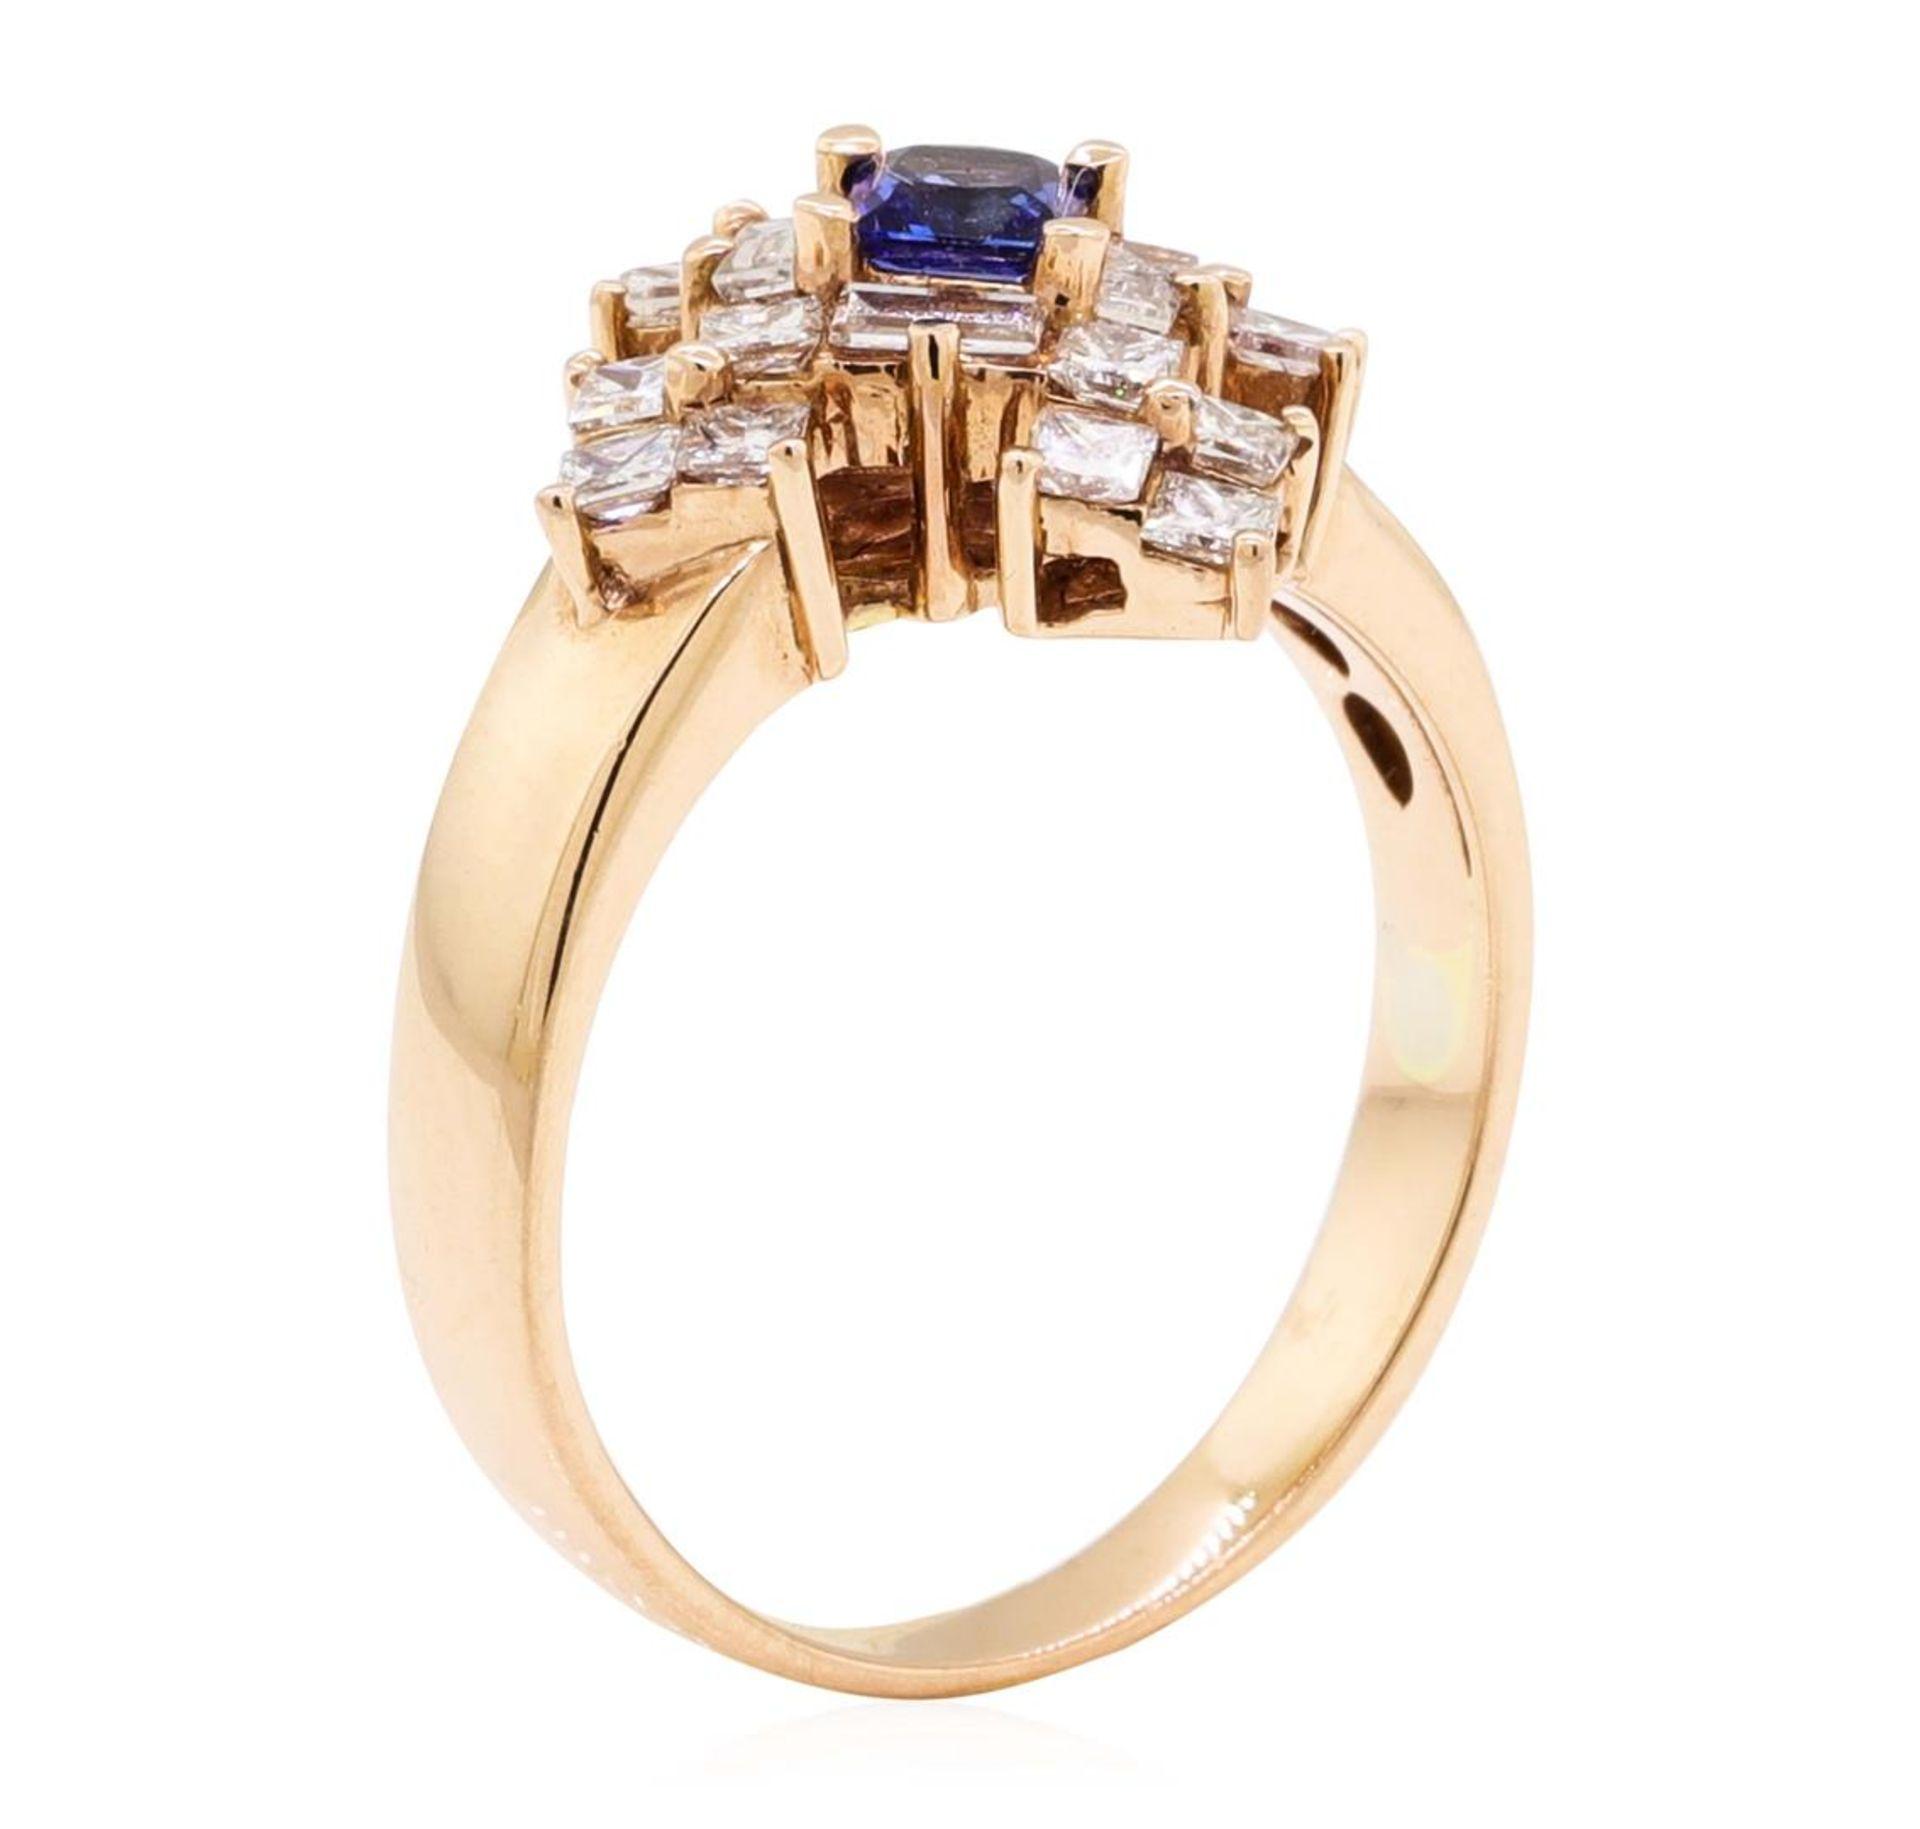 1.16 ctw Princess Brilliant Blue Sapphire And Baguette Cut Diamond Ring - 14KT R - Image 4 of 5